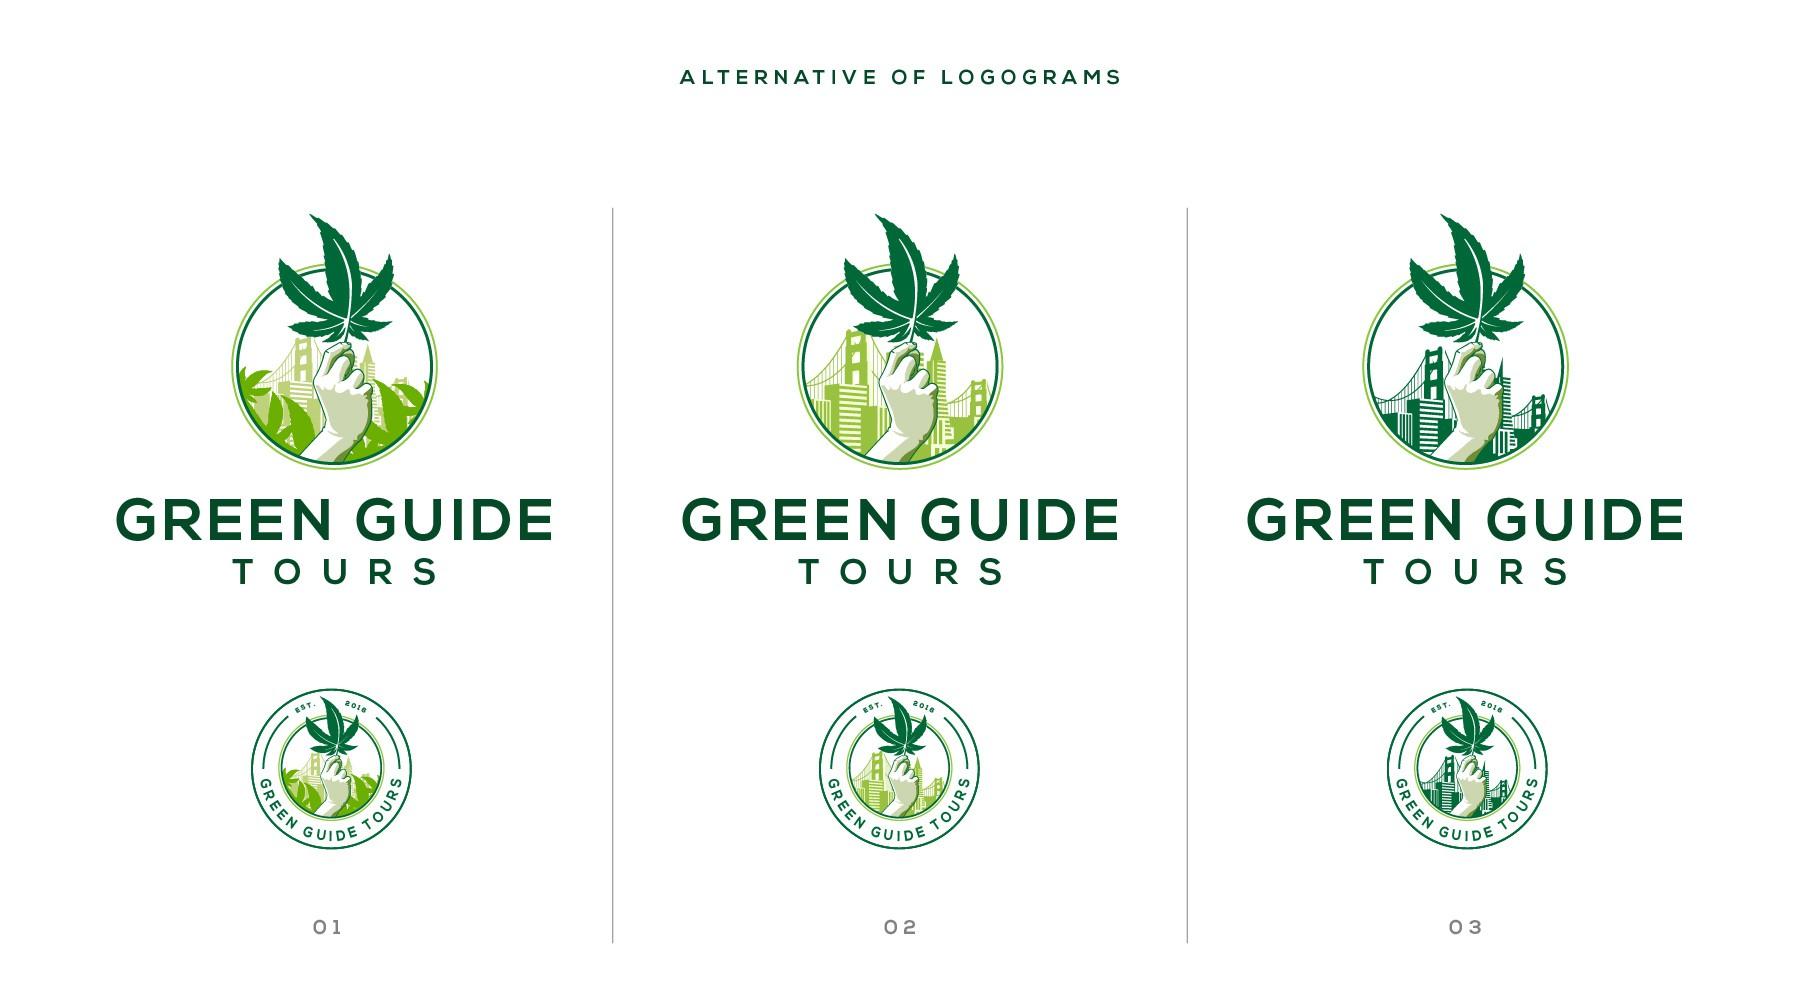 CA's #1 MARIJUANA TOUR - Leaders in Cannabis Experiences.